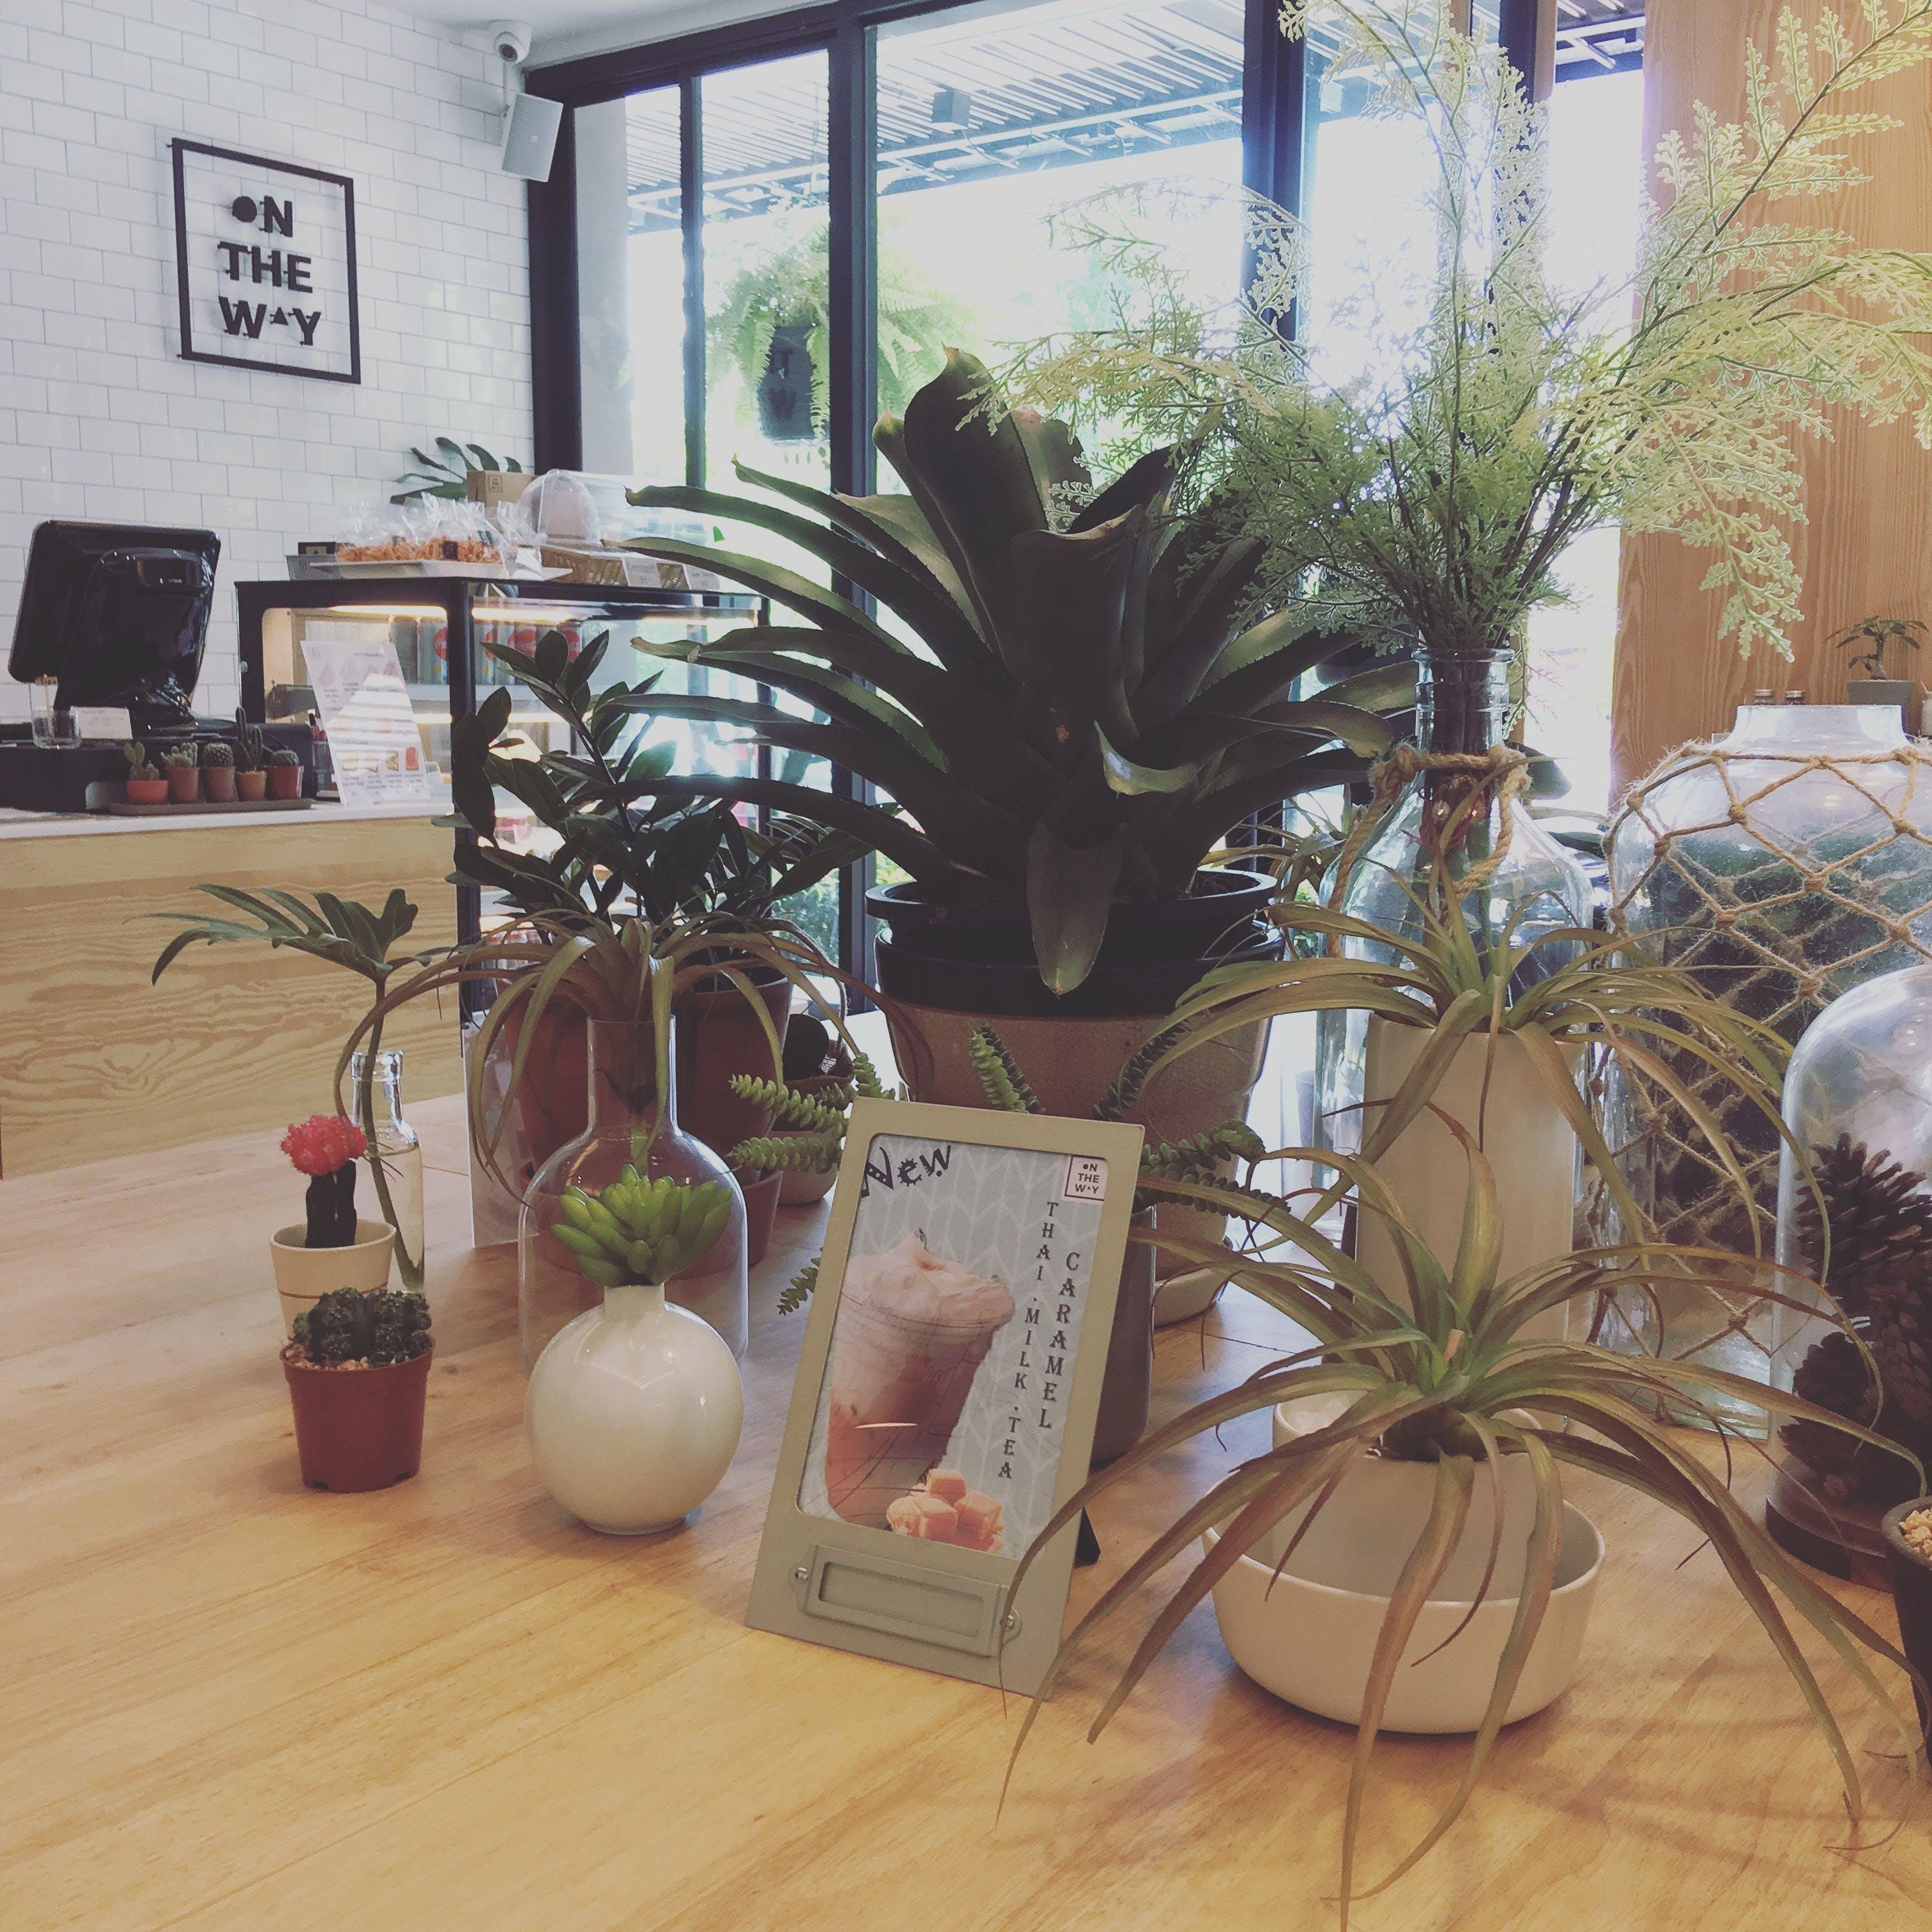 Free stock photo of café, coffee shop, cozy, nature